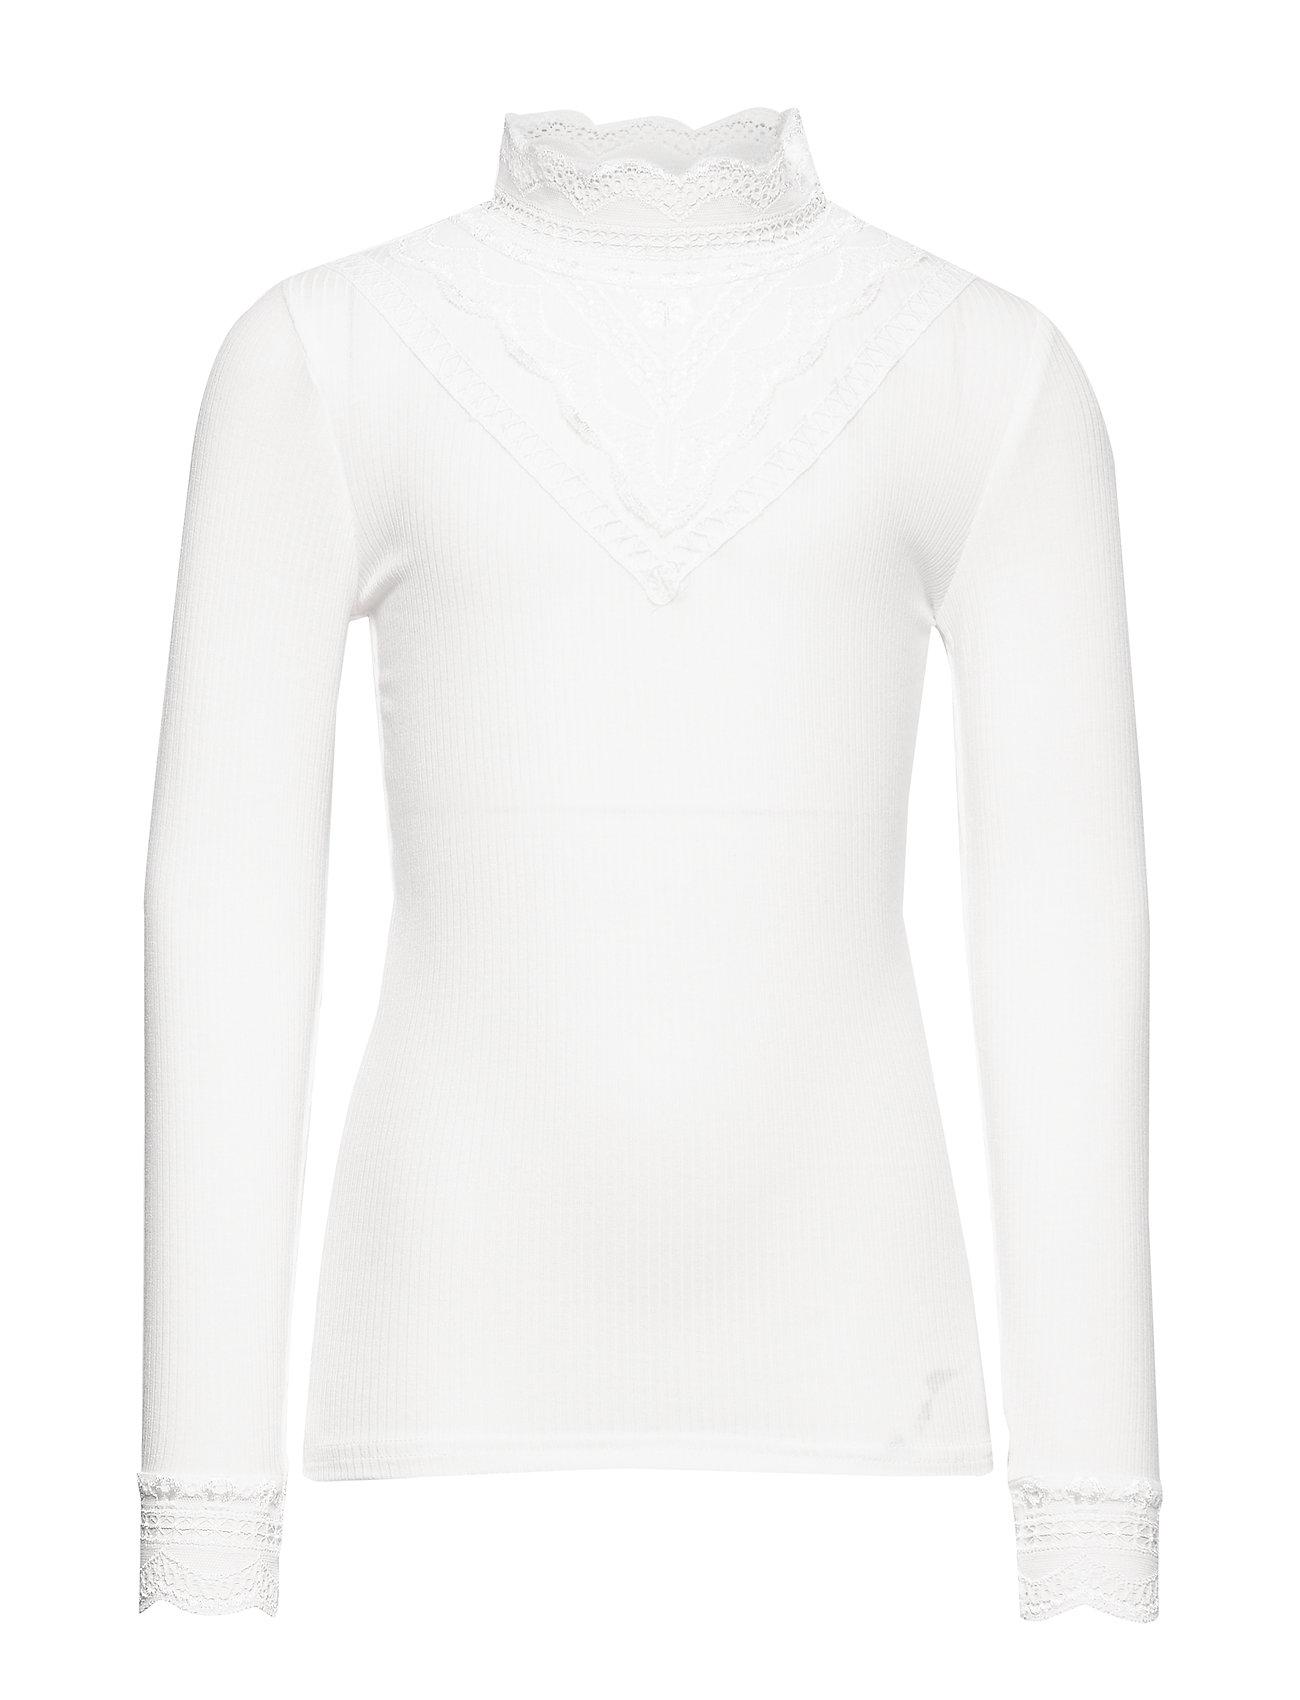 name it NKFRUNI LS XSL TOP NOOS - SNOW WHITE